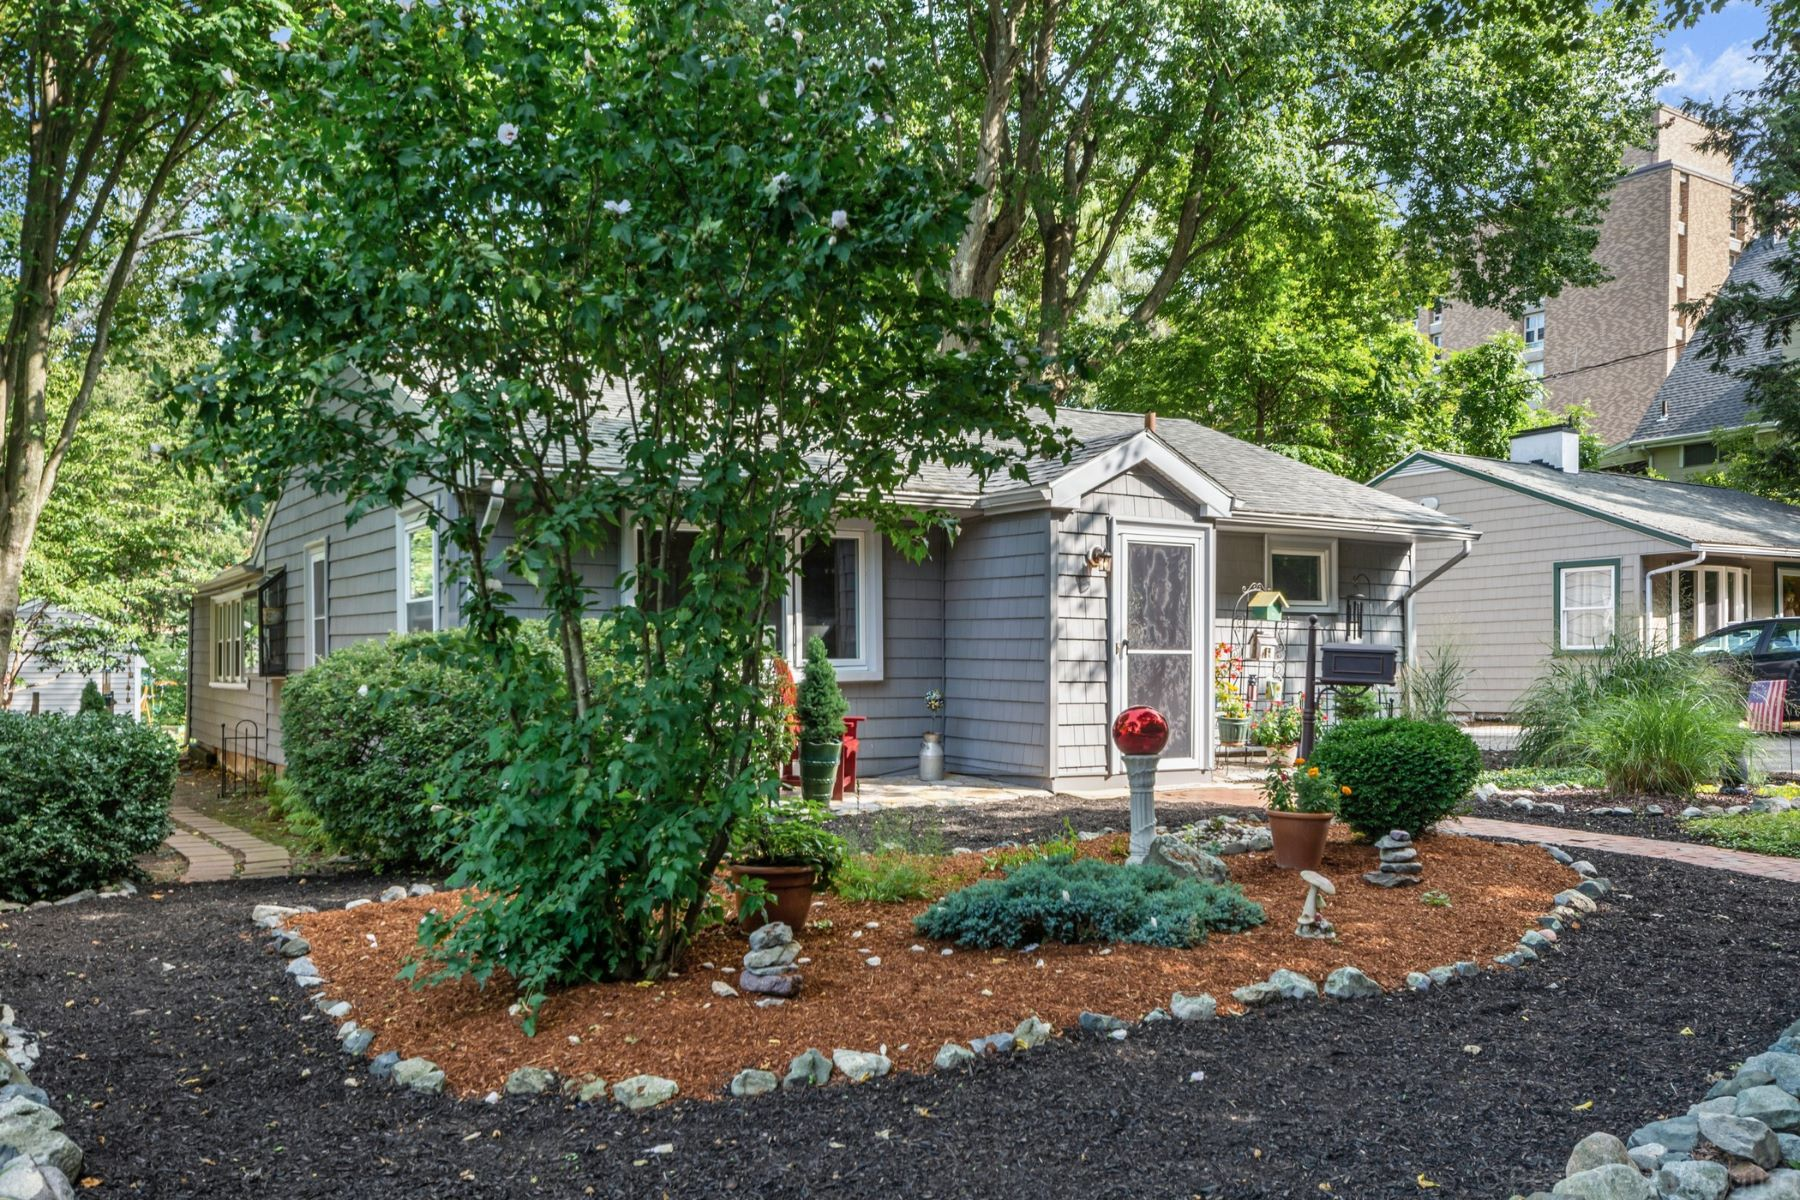 Single Family Homes για την Πώληση στο Melrose, Μασαχουσετη 02176 Ηνωμένες Πολιτείες